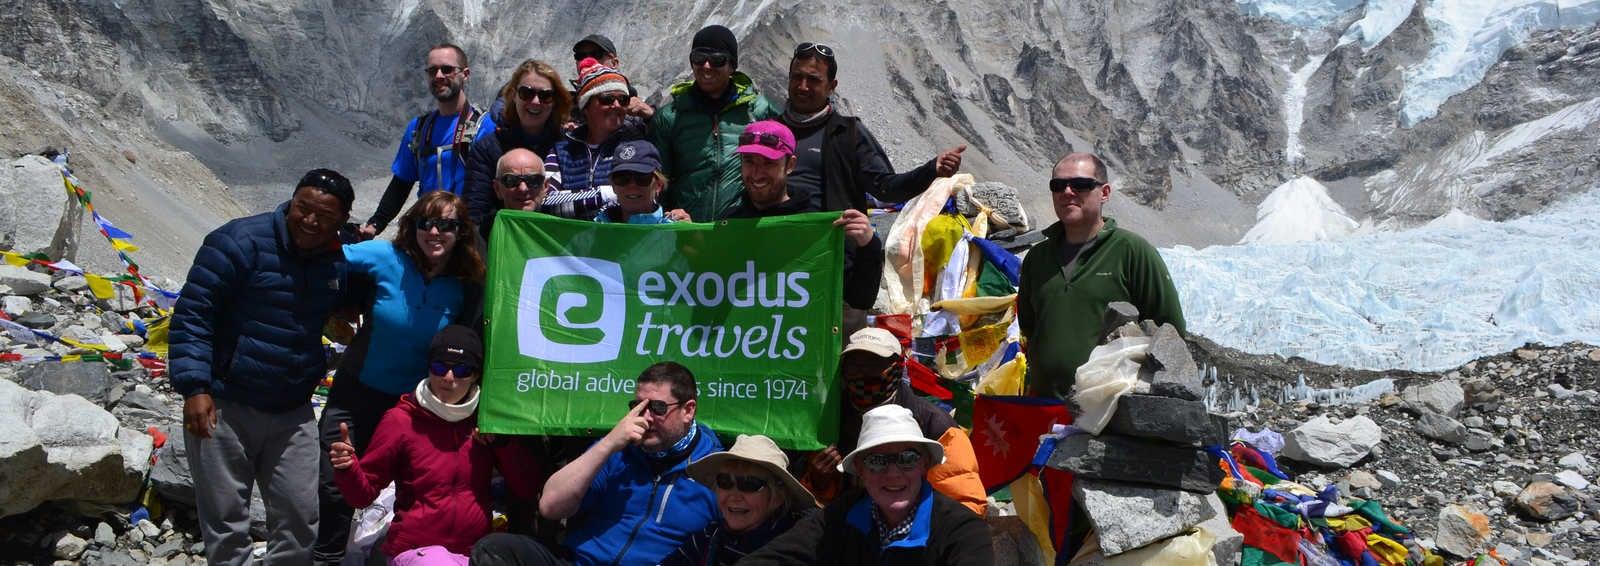 Exodus group at the Everest Base Camp